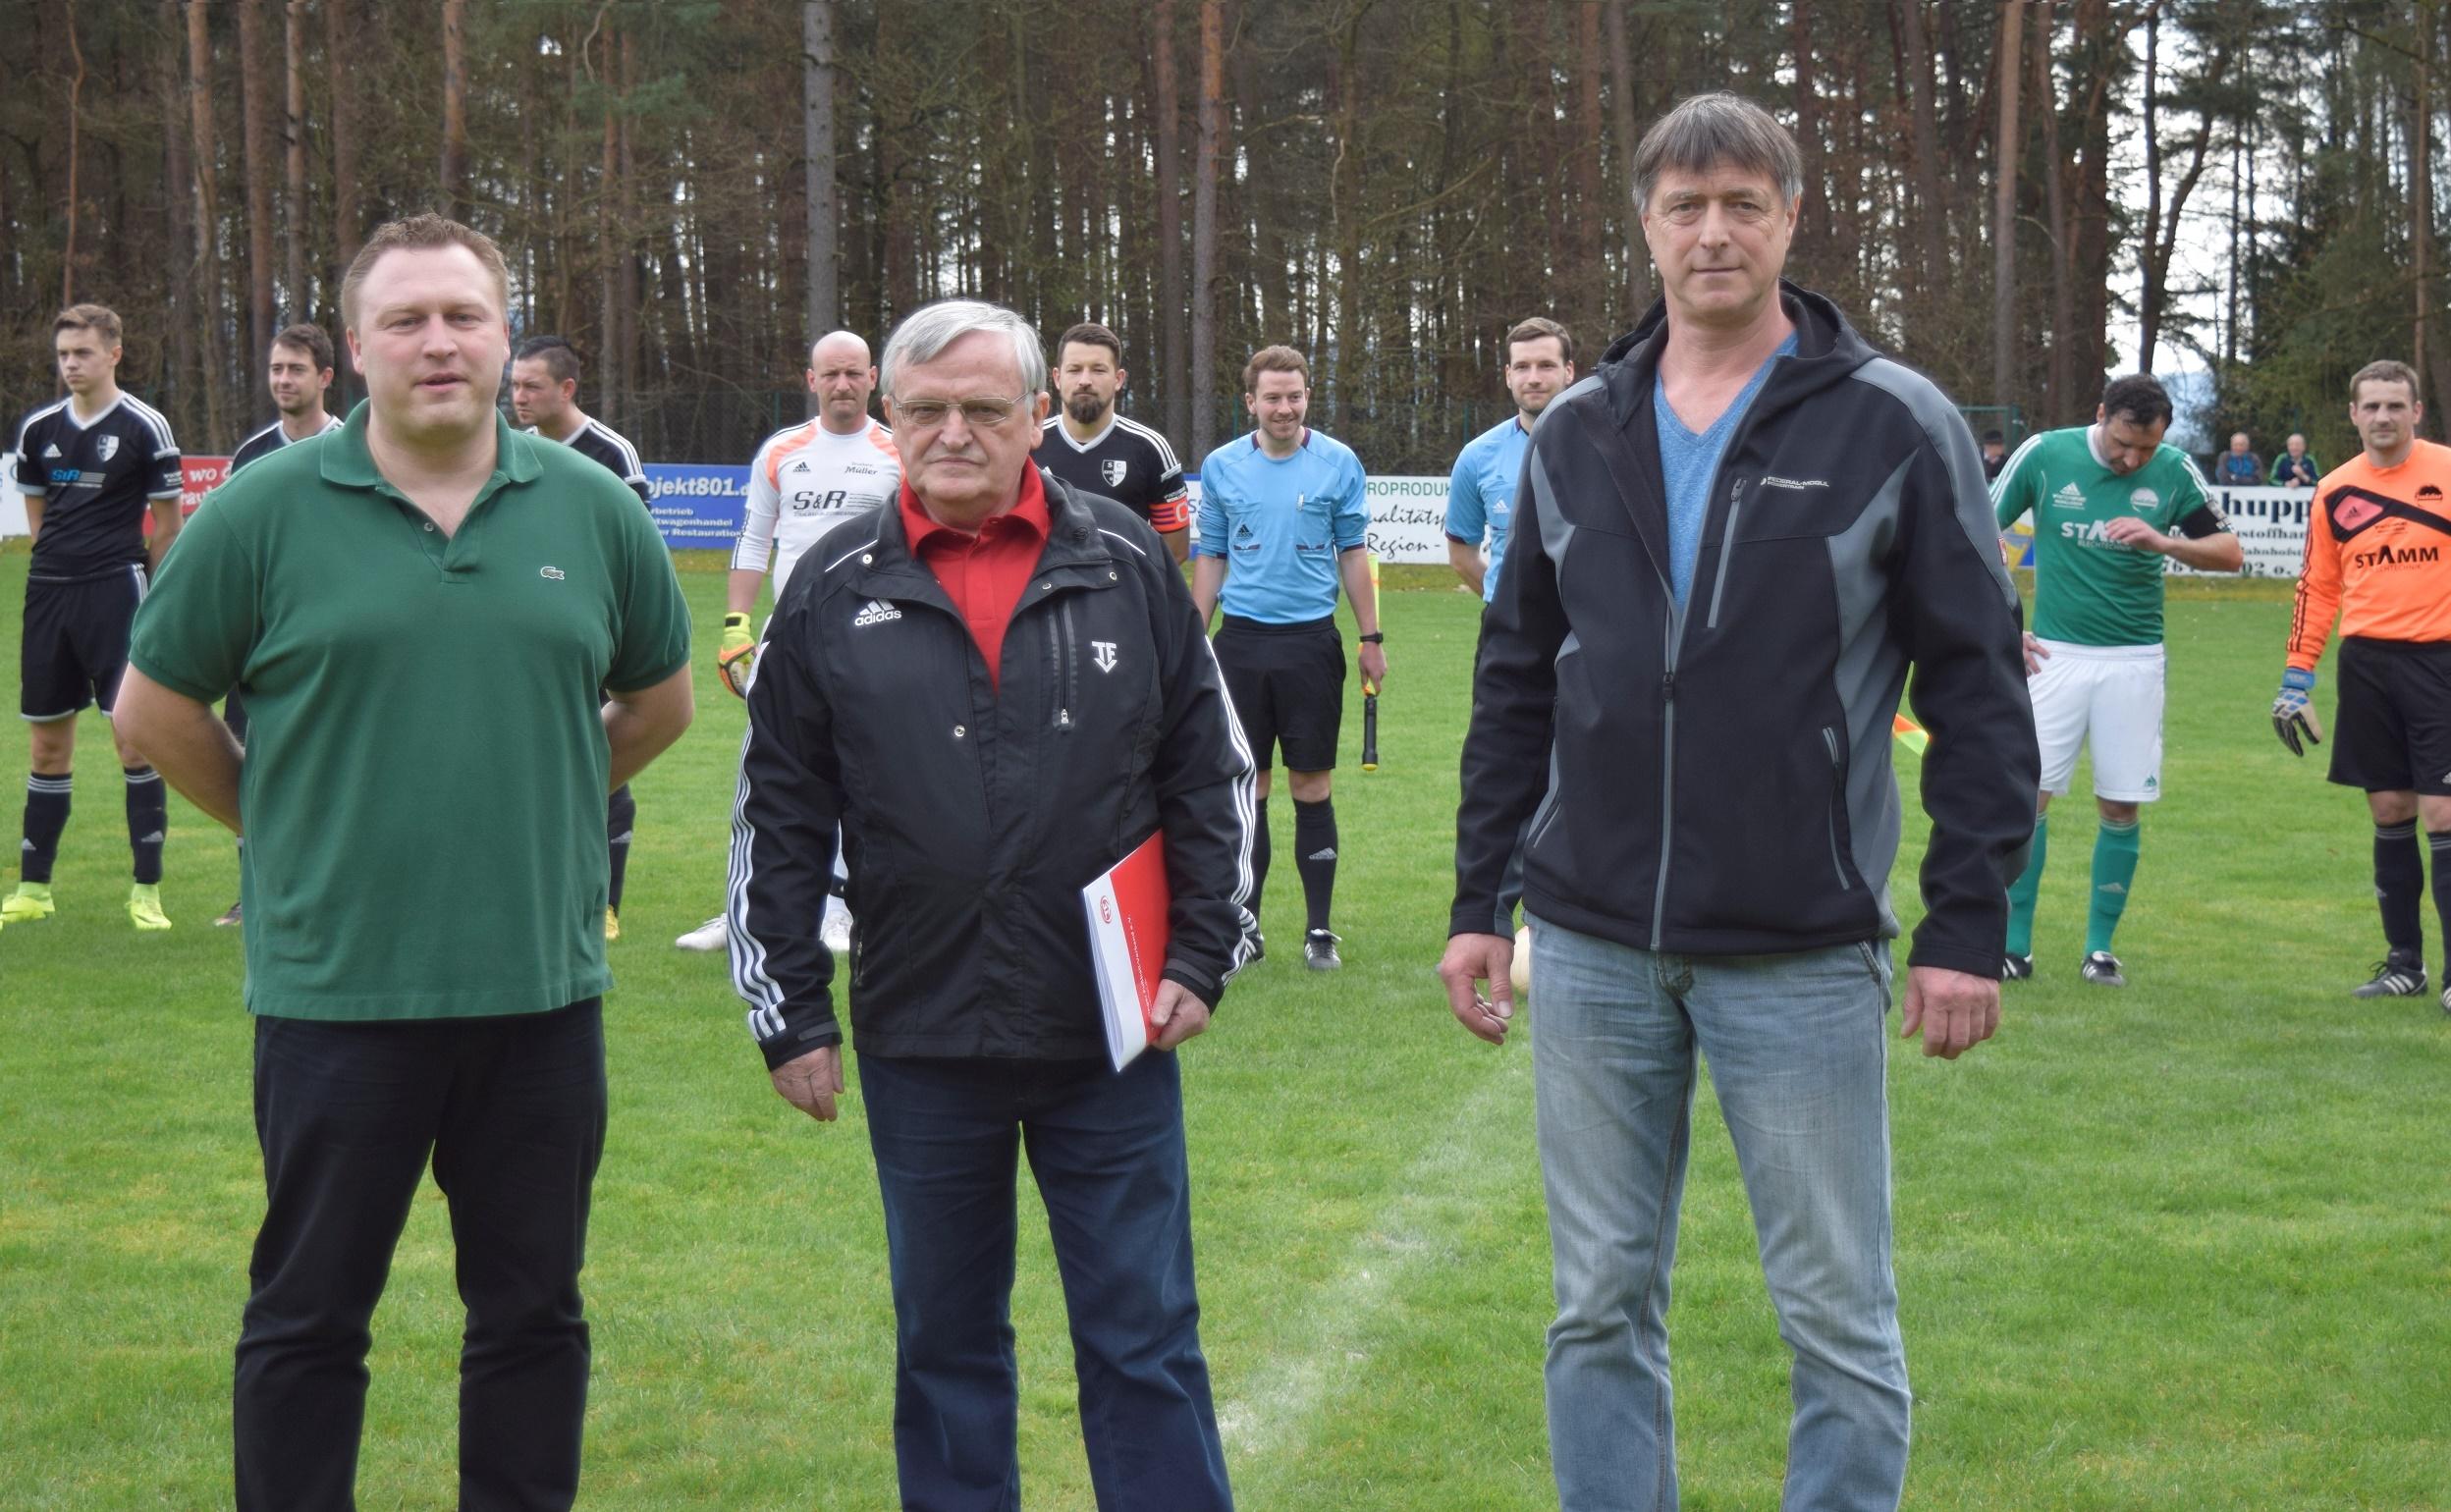 v.l.n.r.: Steffen Breitung, Dittmar Börner, Andreas Meusel